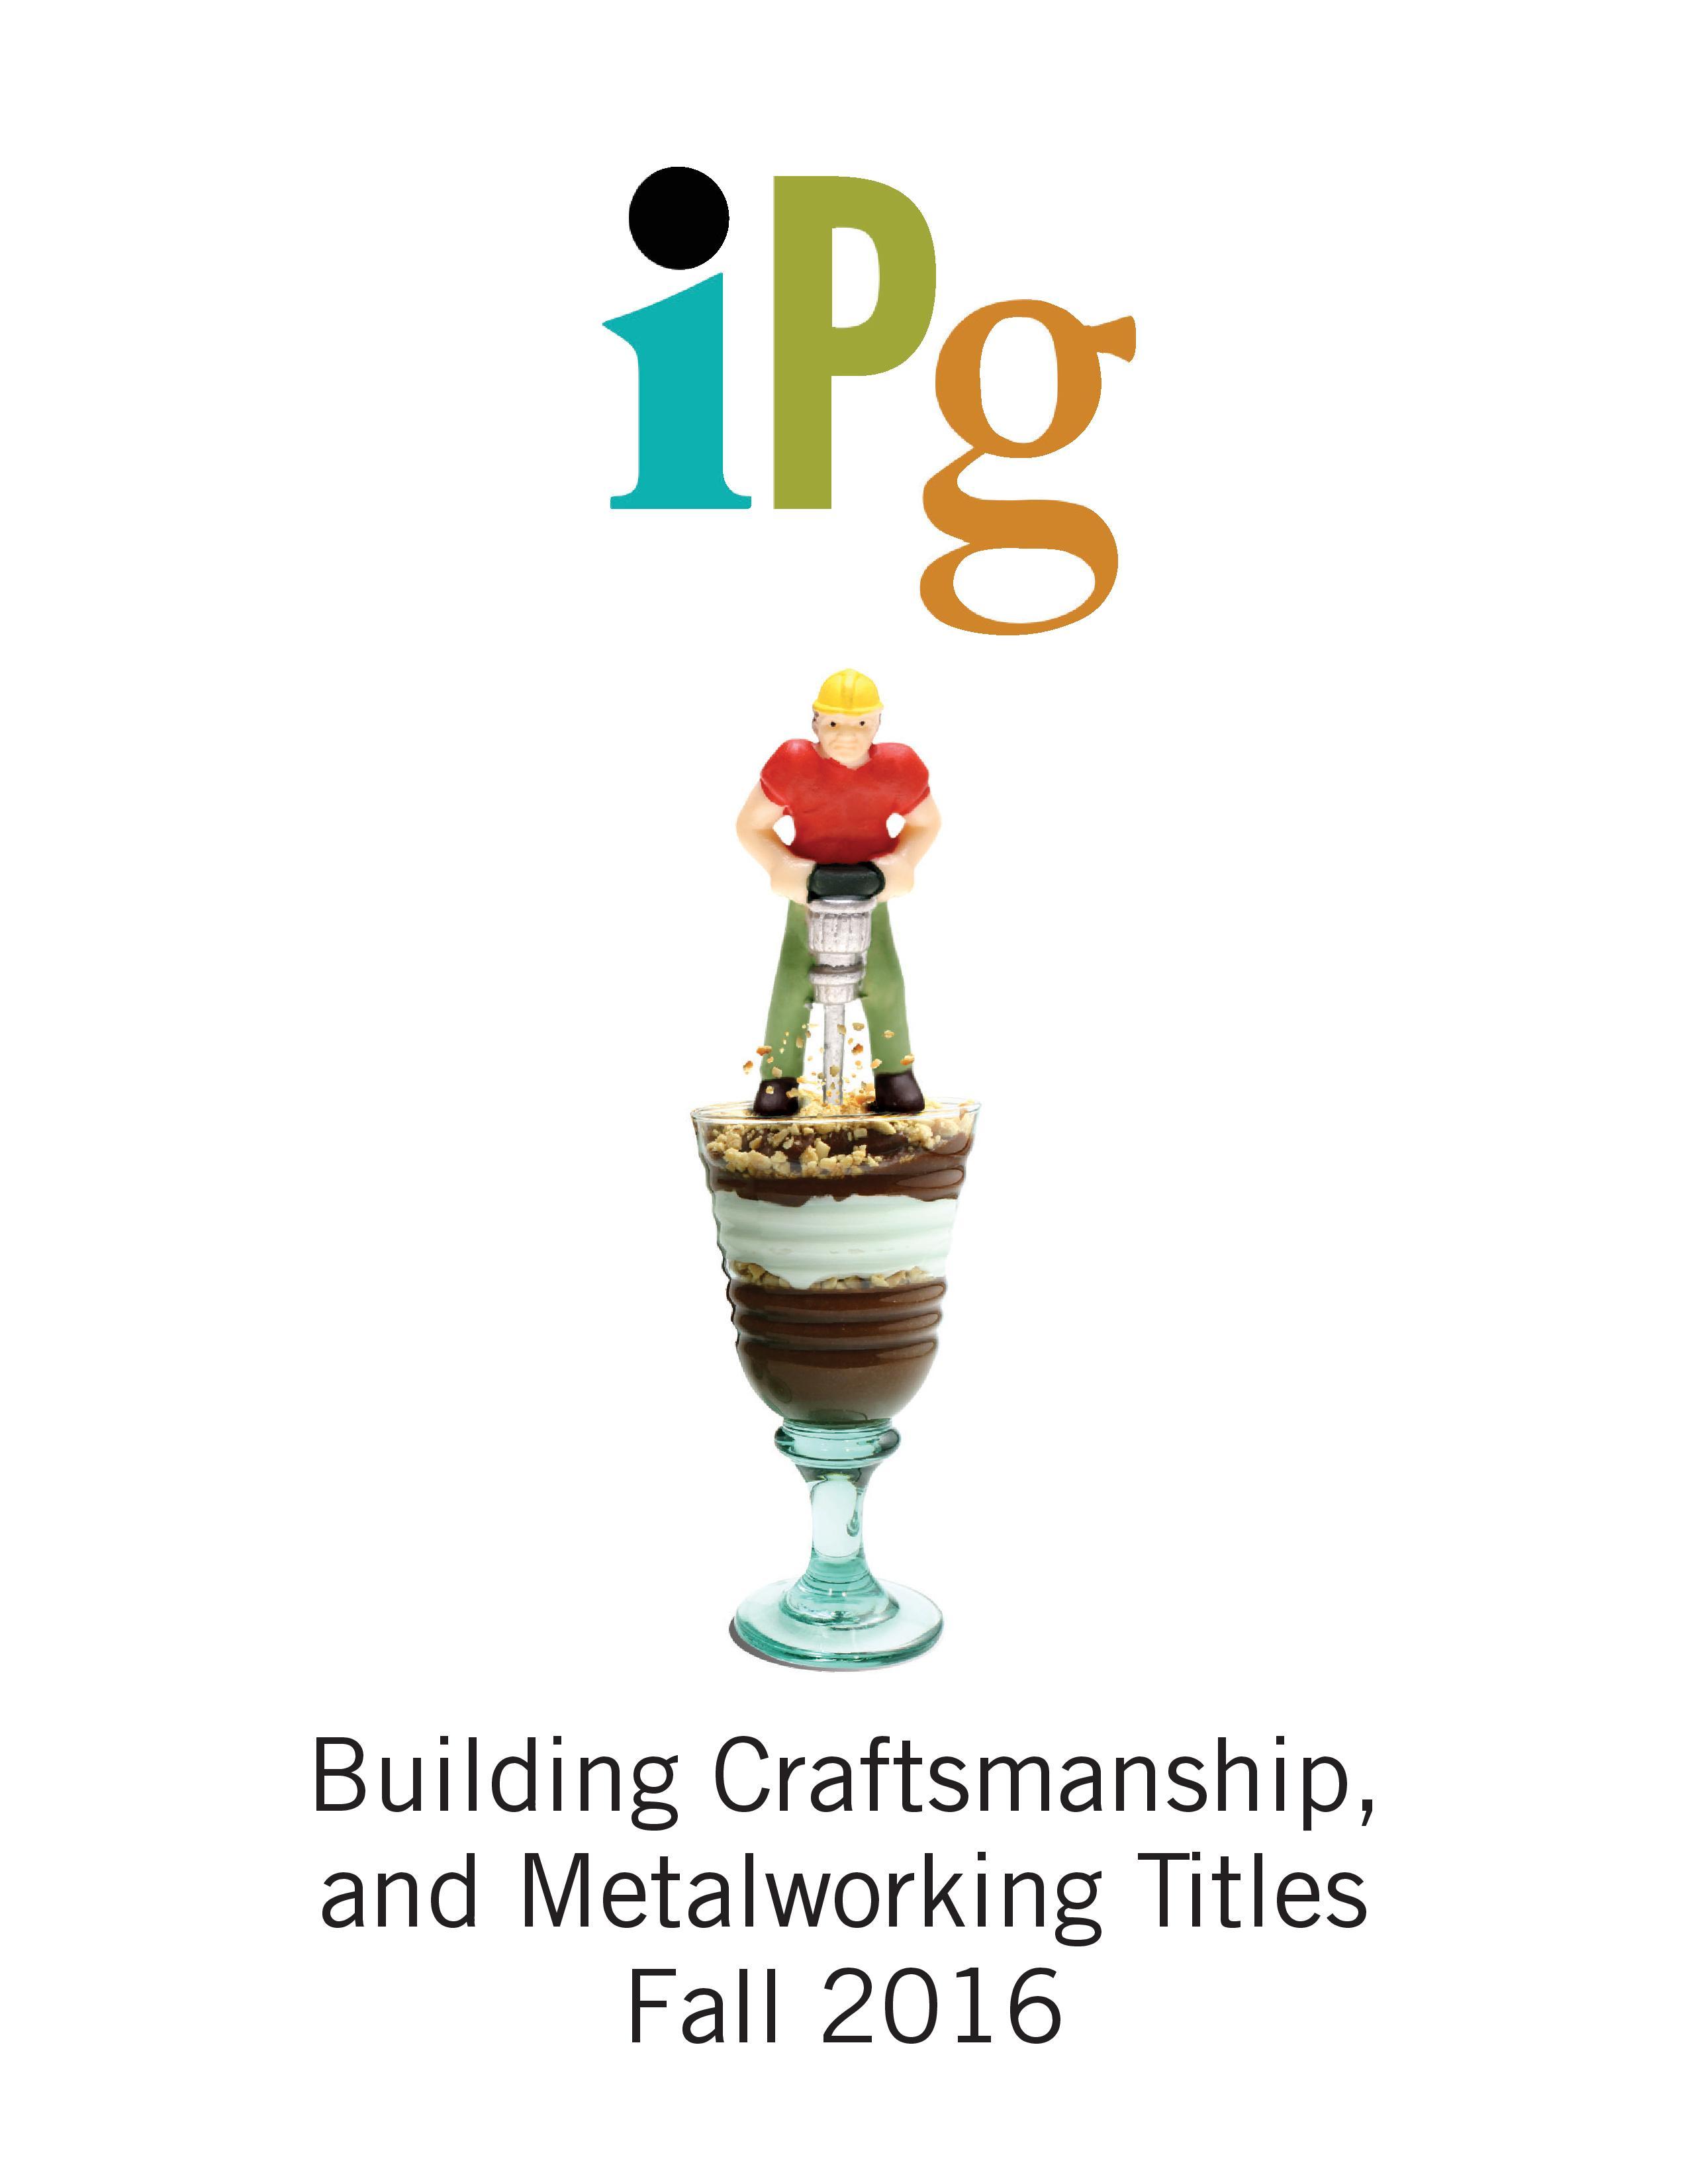 Building, Craftsmanship, and Metal Working Titles